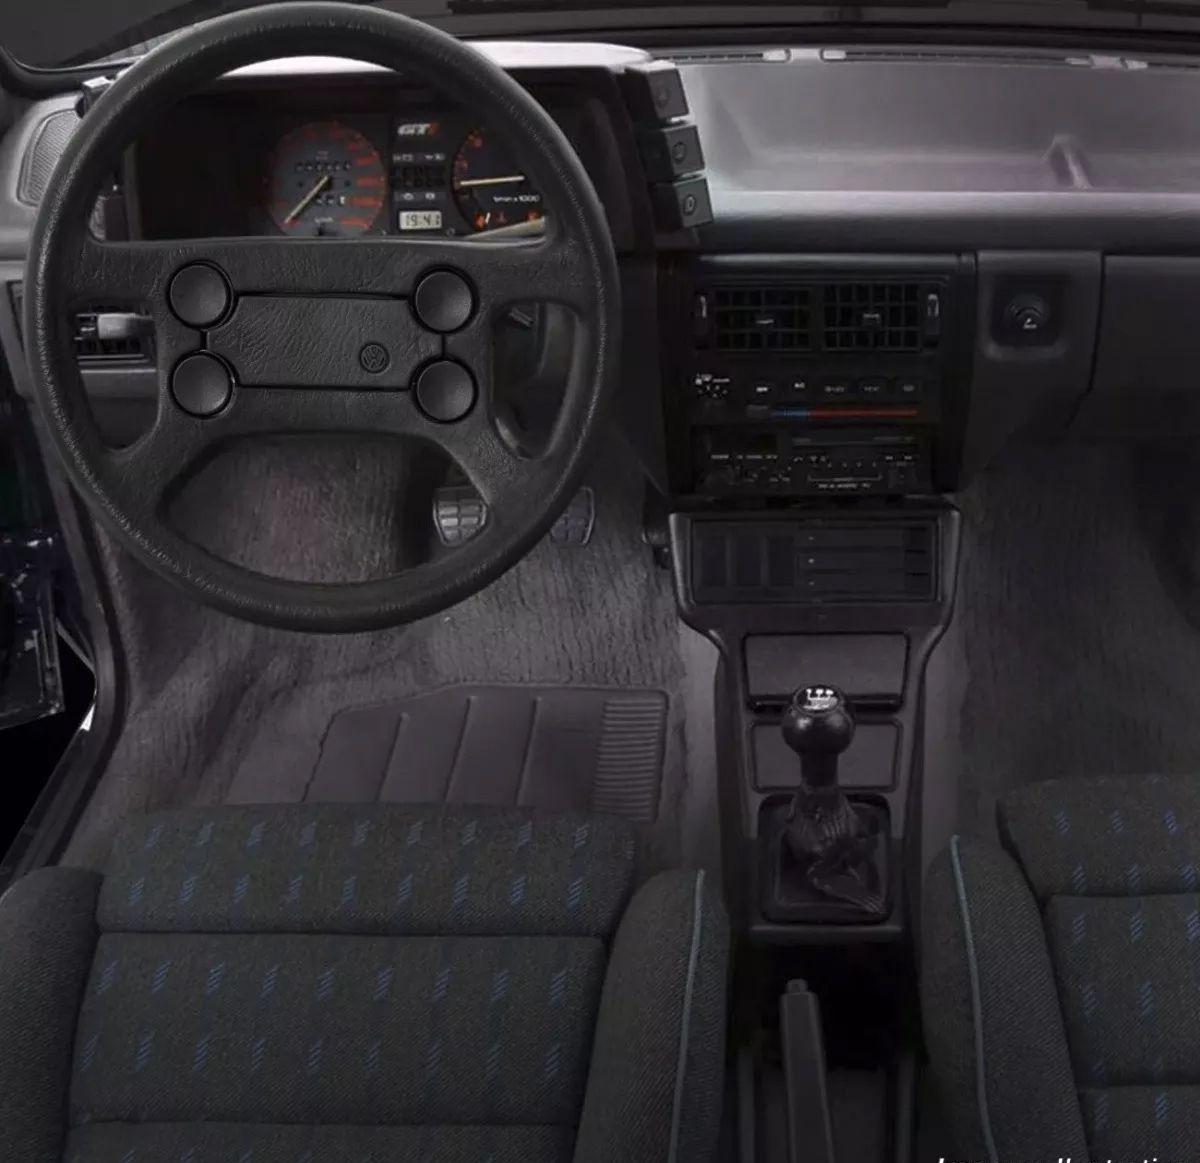 Volante Original Volkswagen 4 Bolas Cubo Gol Parati Passat Saveiro Voyage Poliparts